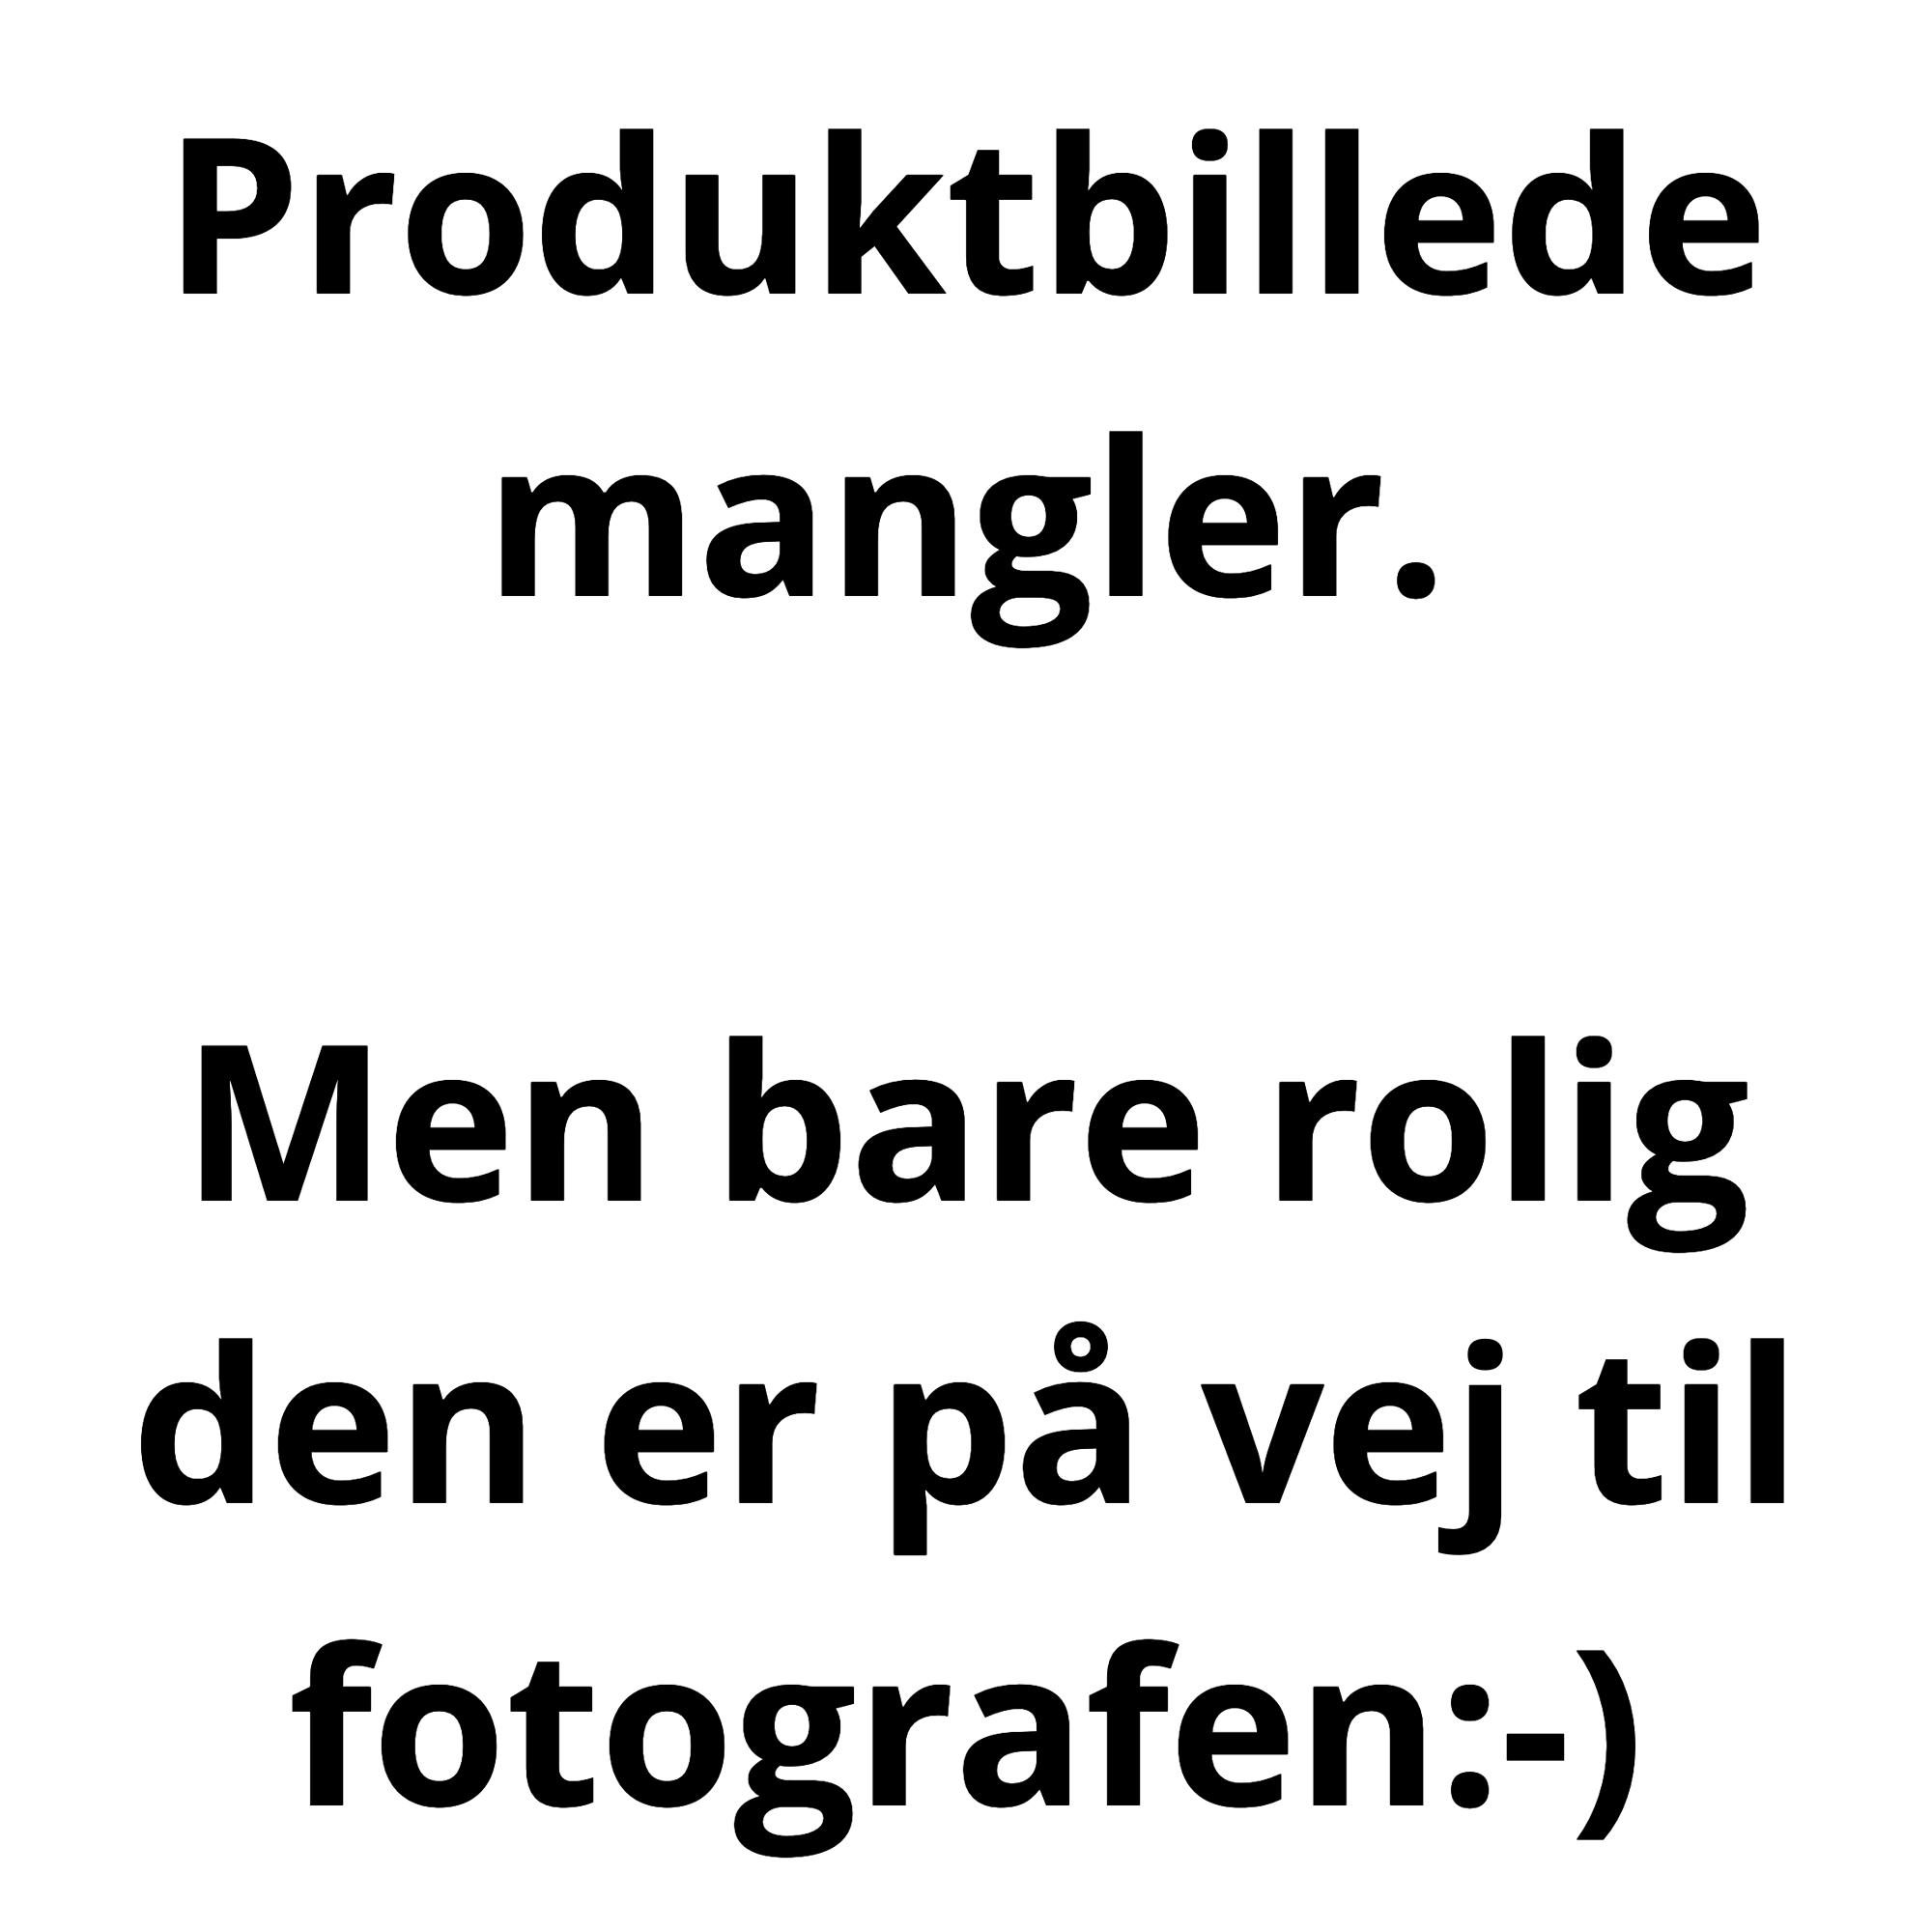 Brodit Samsung Galaxy S6, S6 Edge og S7 med beskyttelsescover - Aktiv Holder m. USB adapter